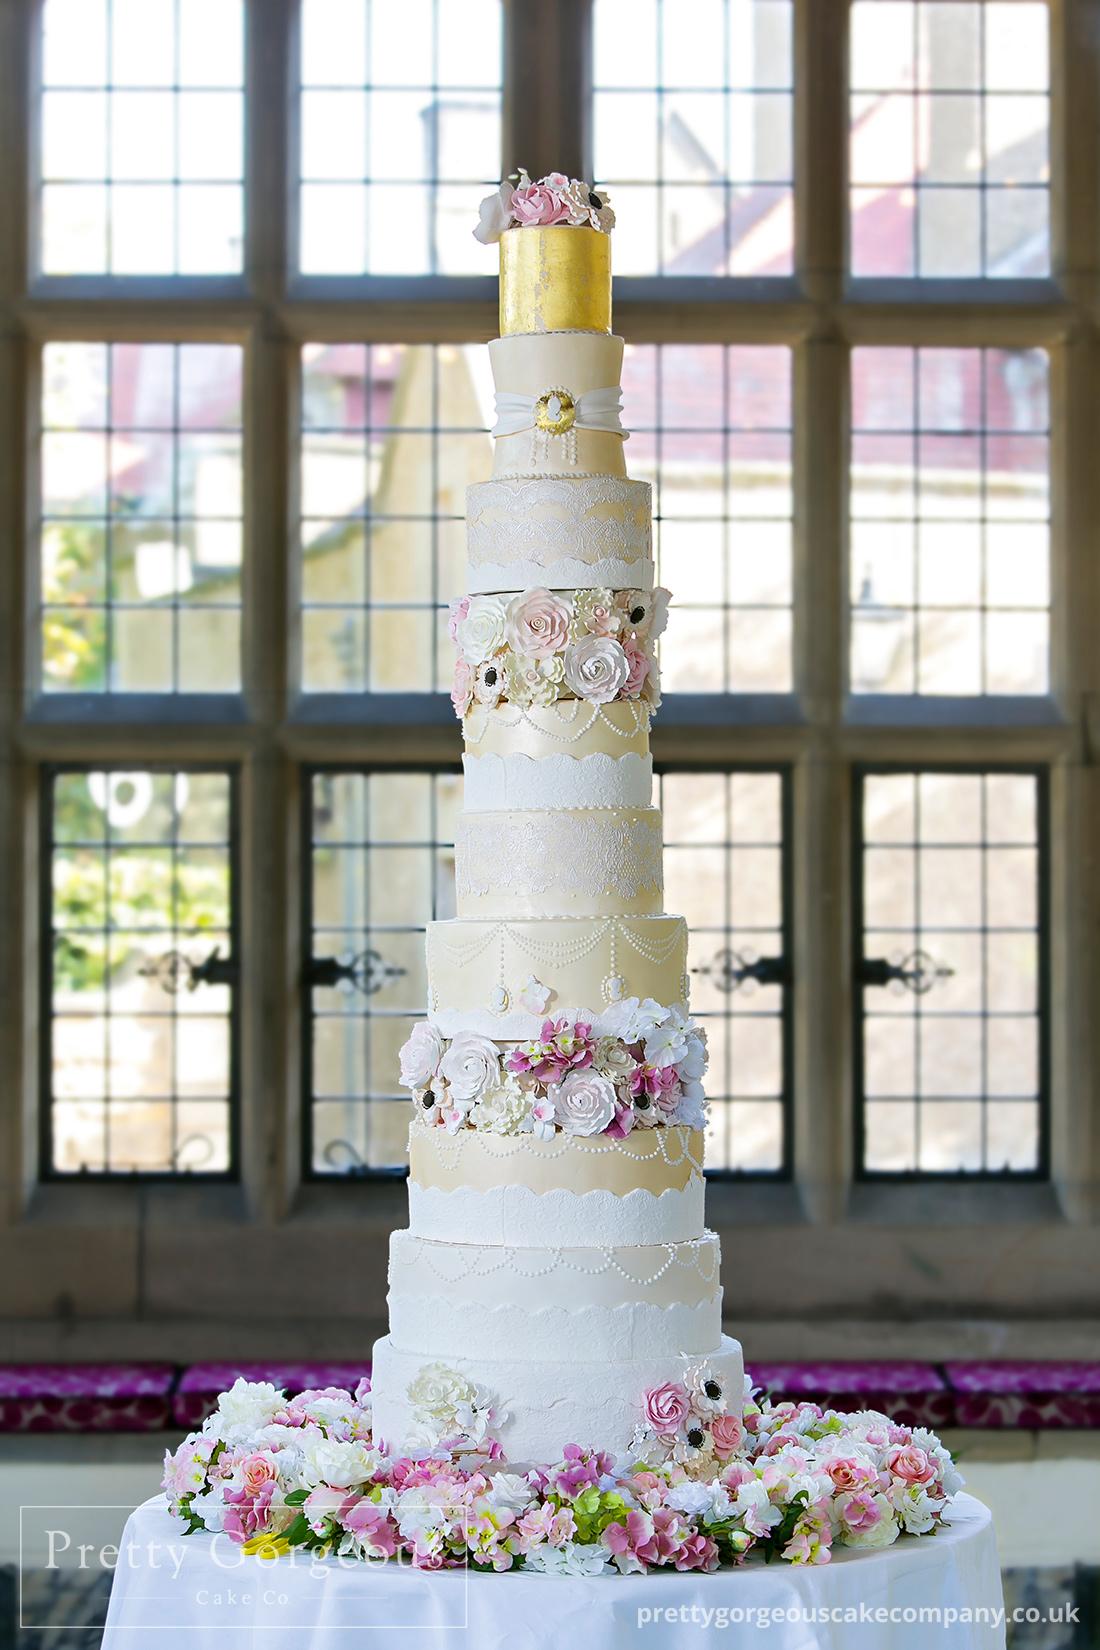 grand wedding cake, extra tall wedding cake, Wedding cake, detail, tiers, gold, photography